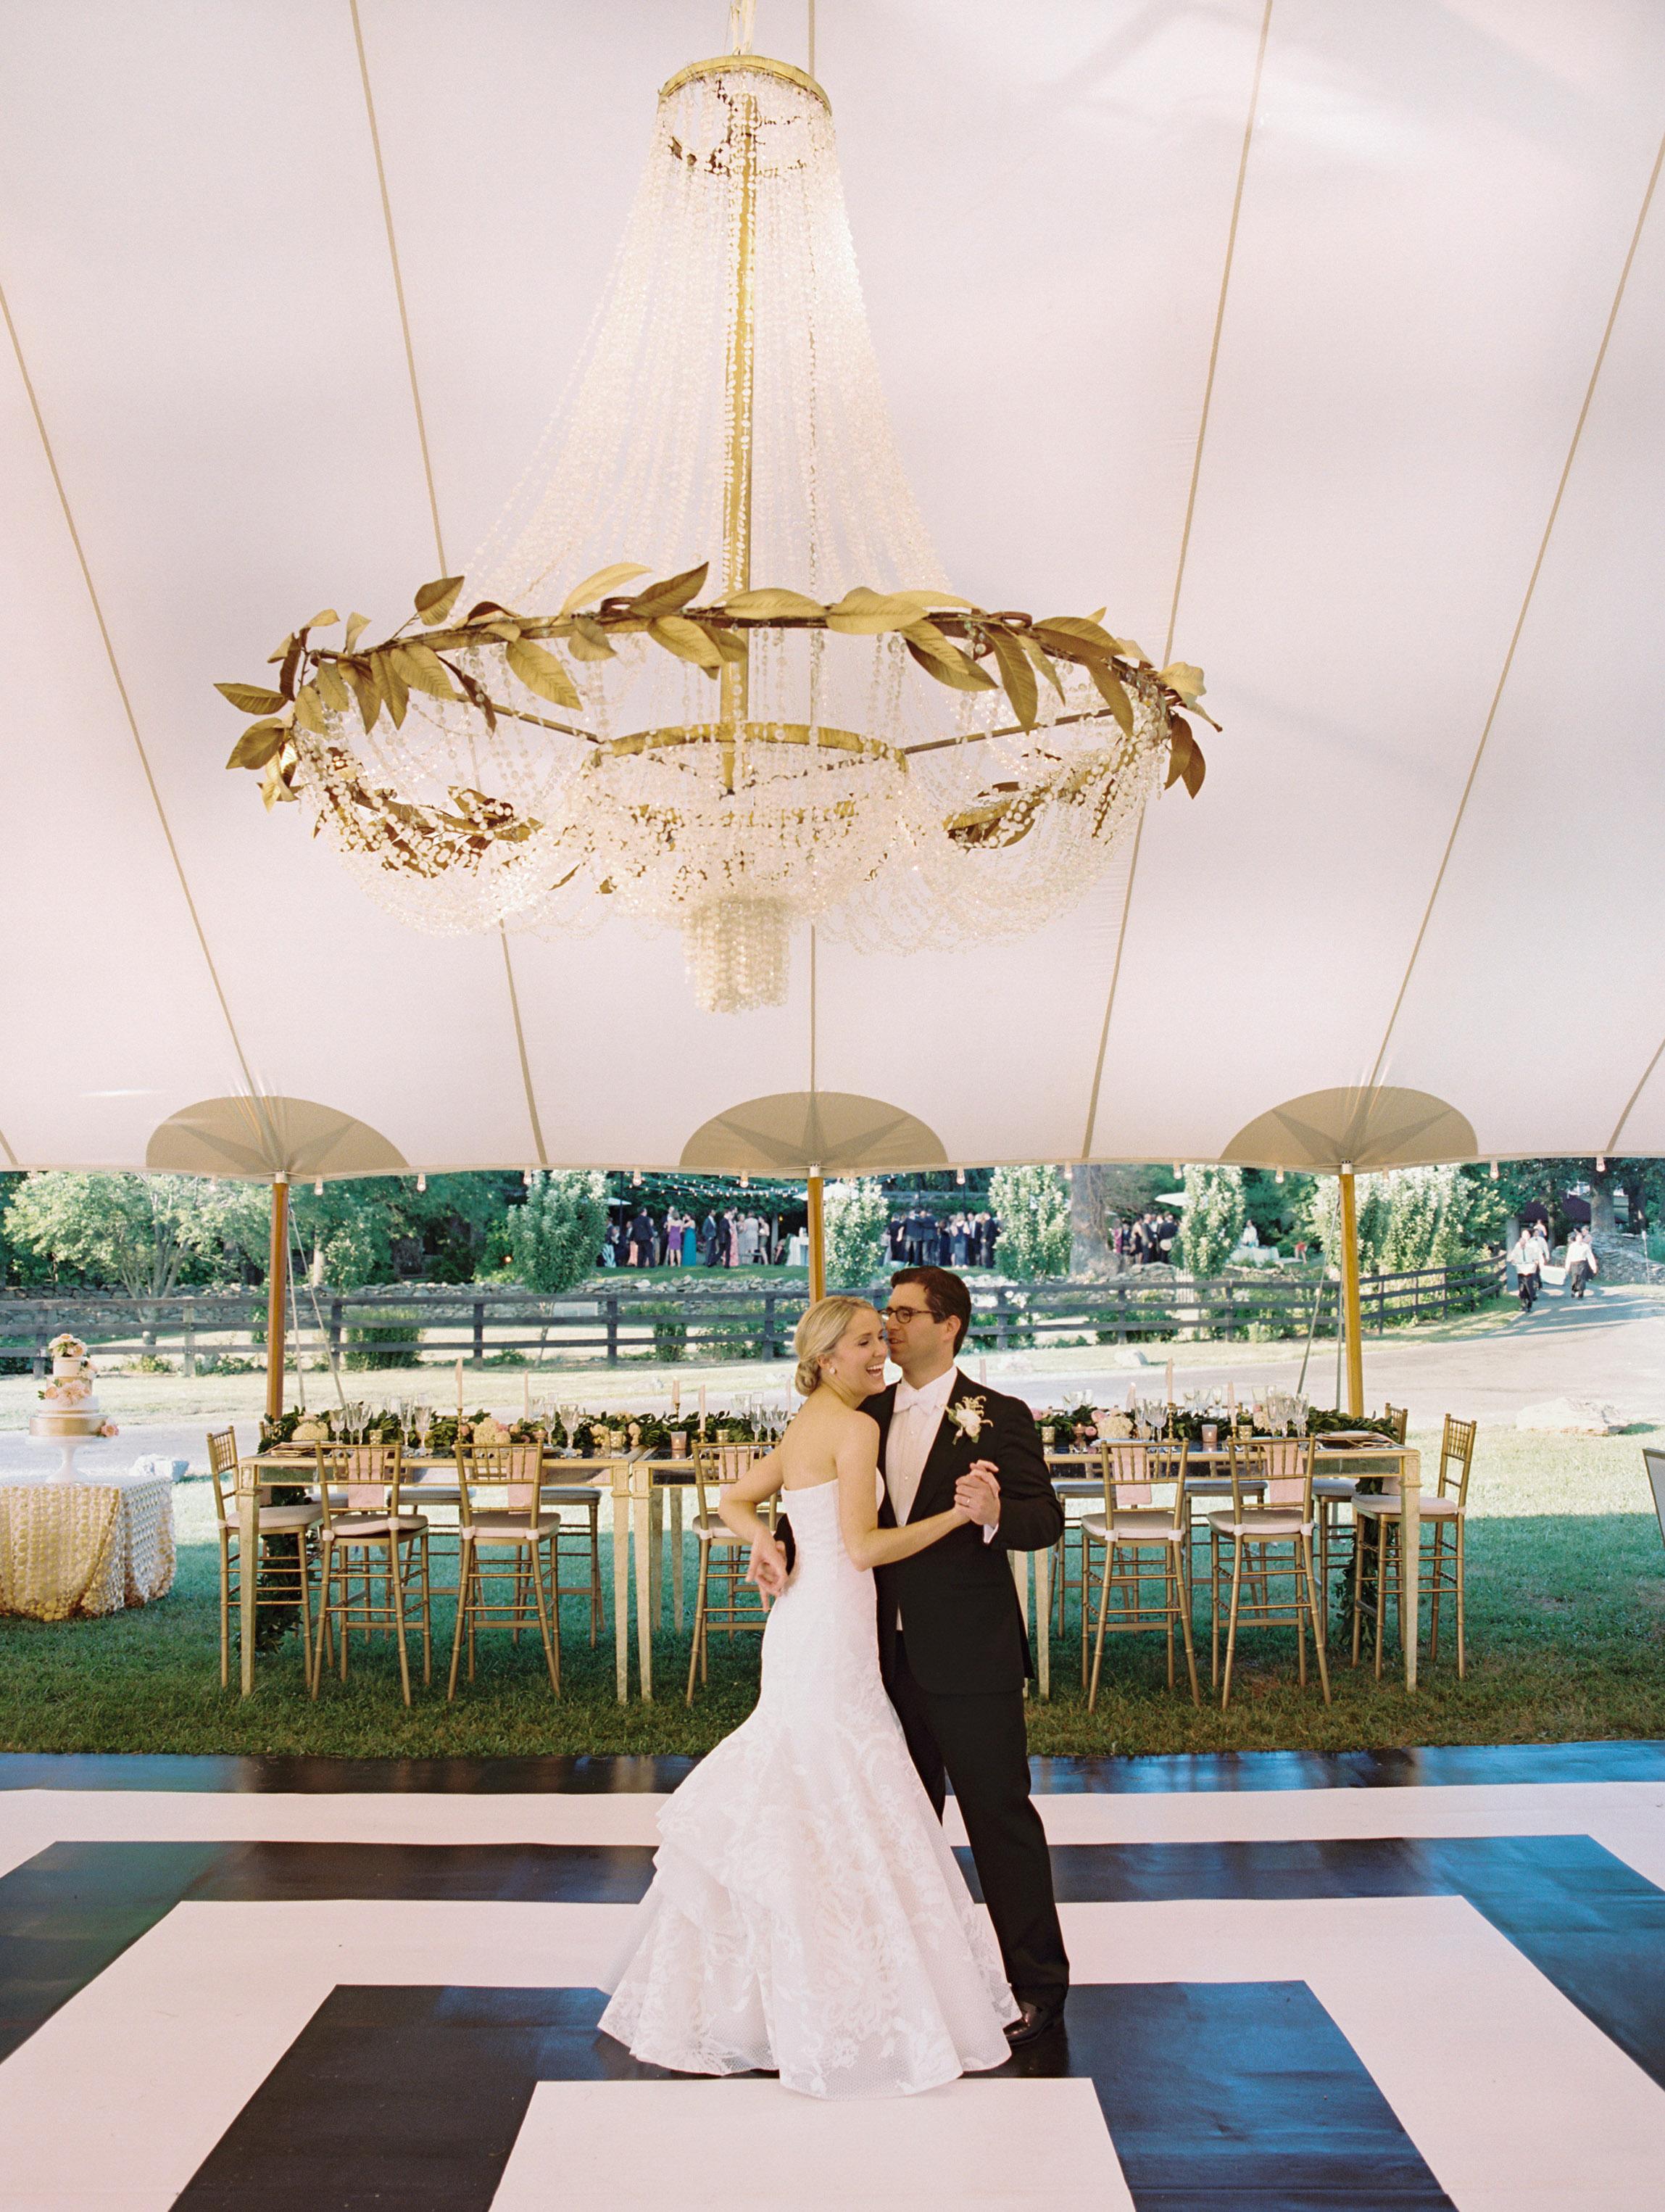 wedding chandelier greek style large tent centerpiece